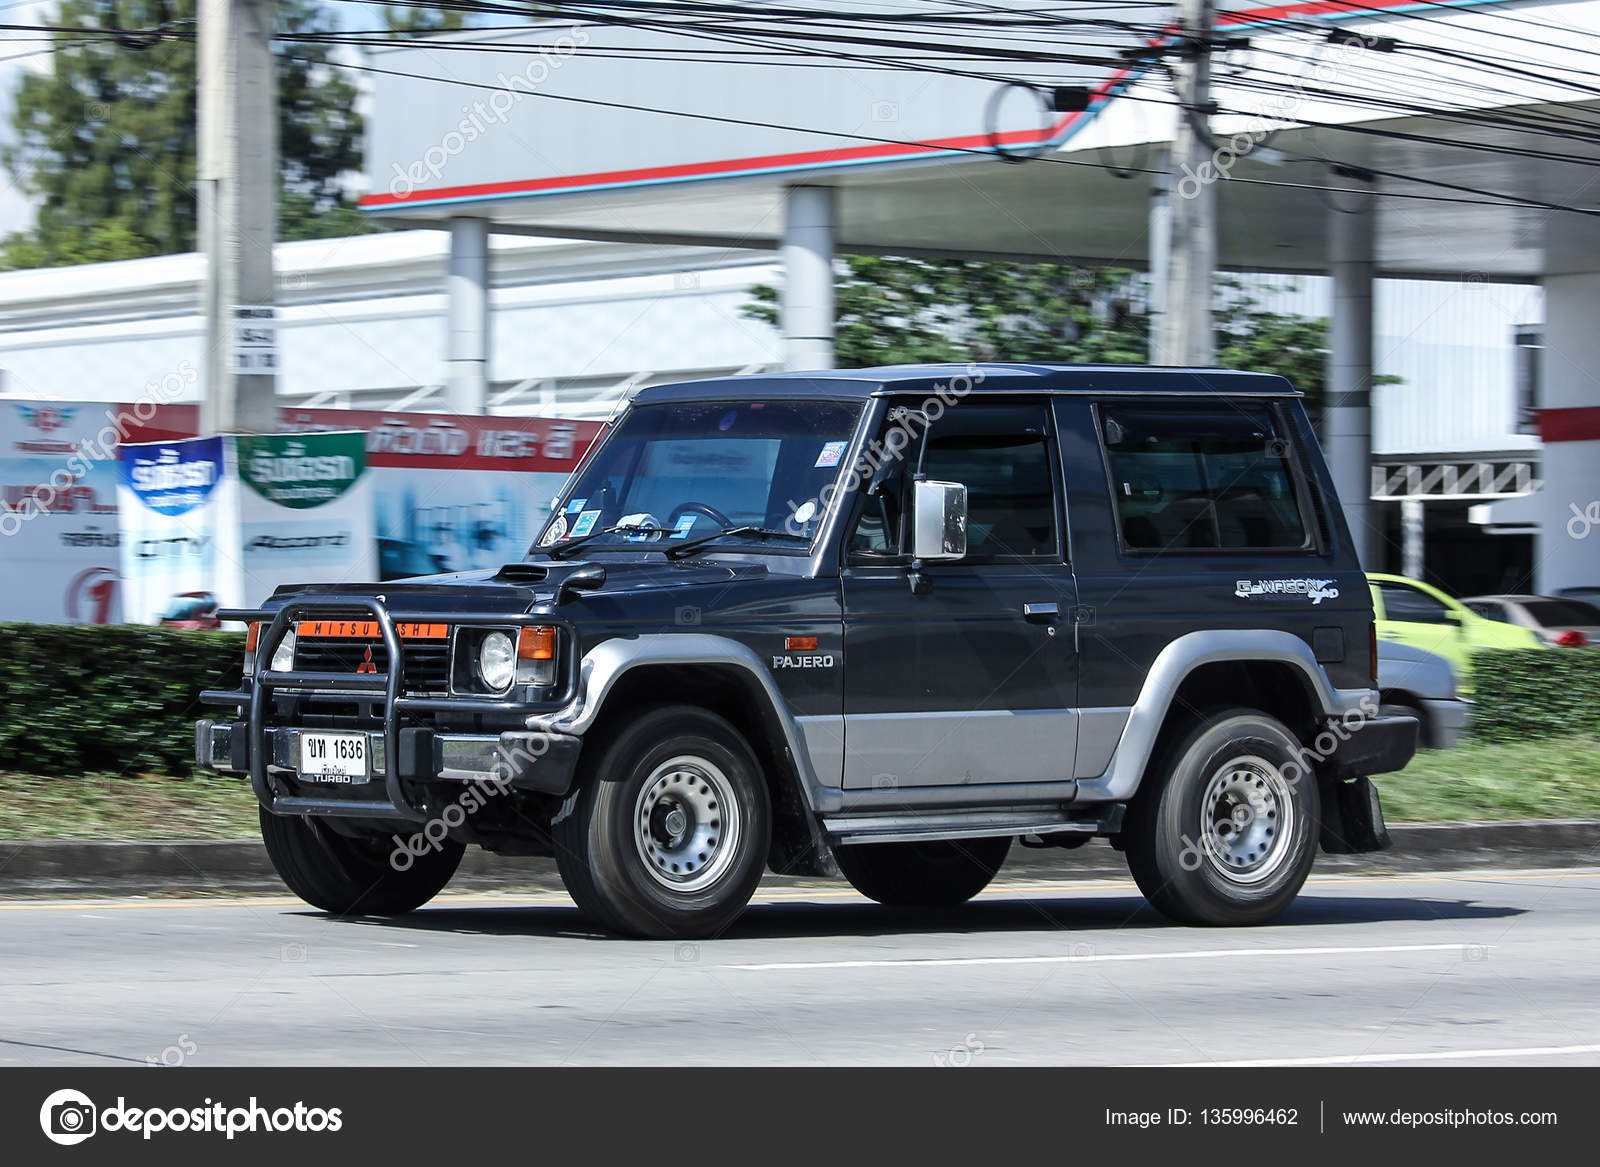 630 Gambar Mobil Pajero Dakar Turbo Terbaik